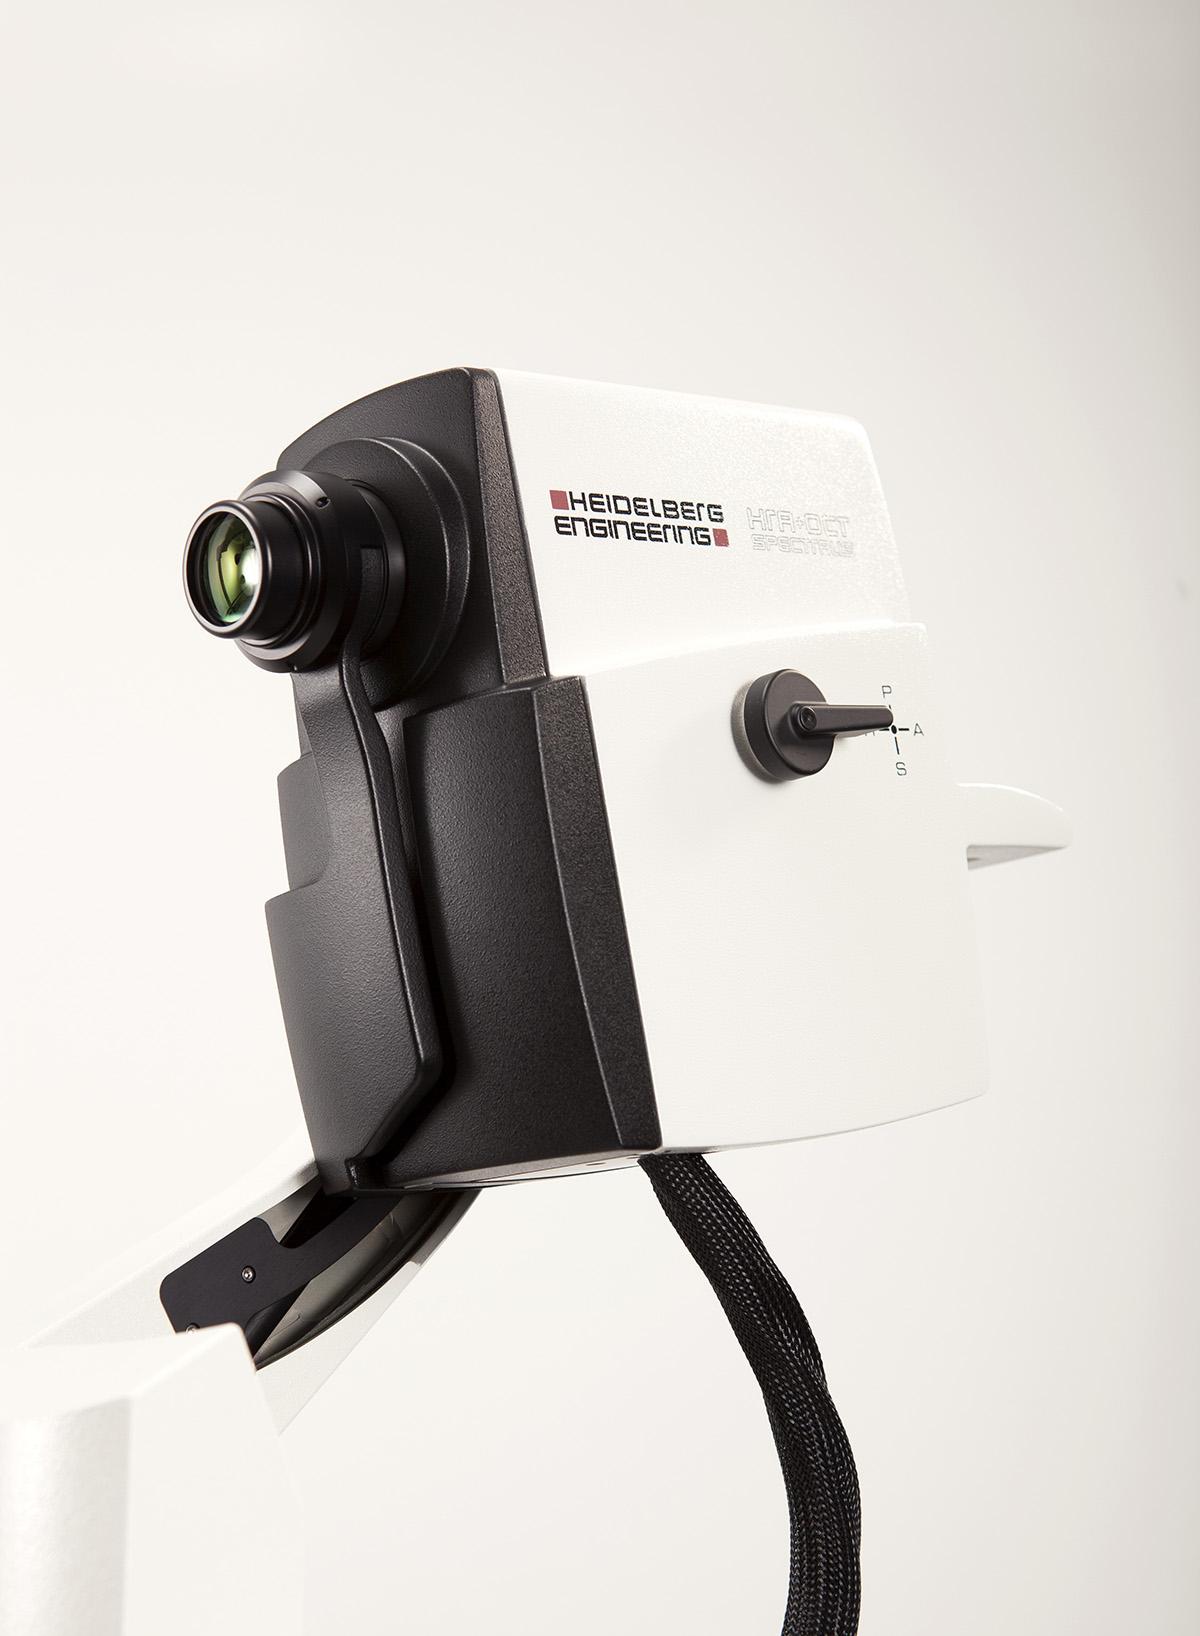 SPECTRALIS HRA OCT Camera head